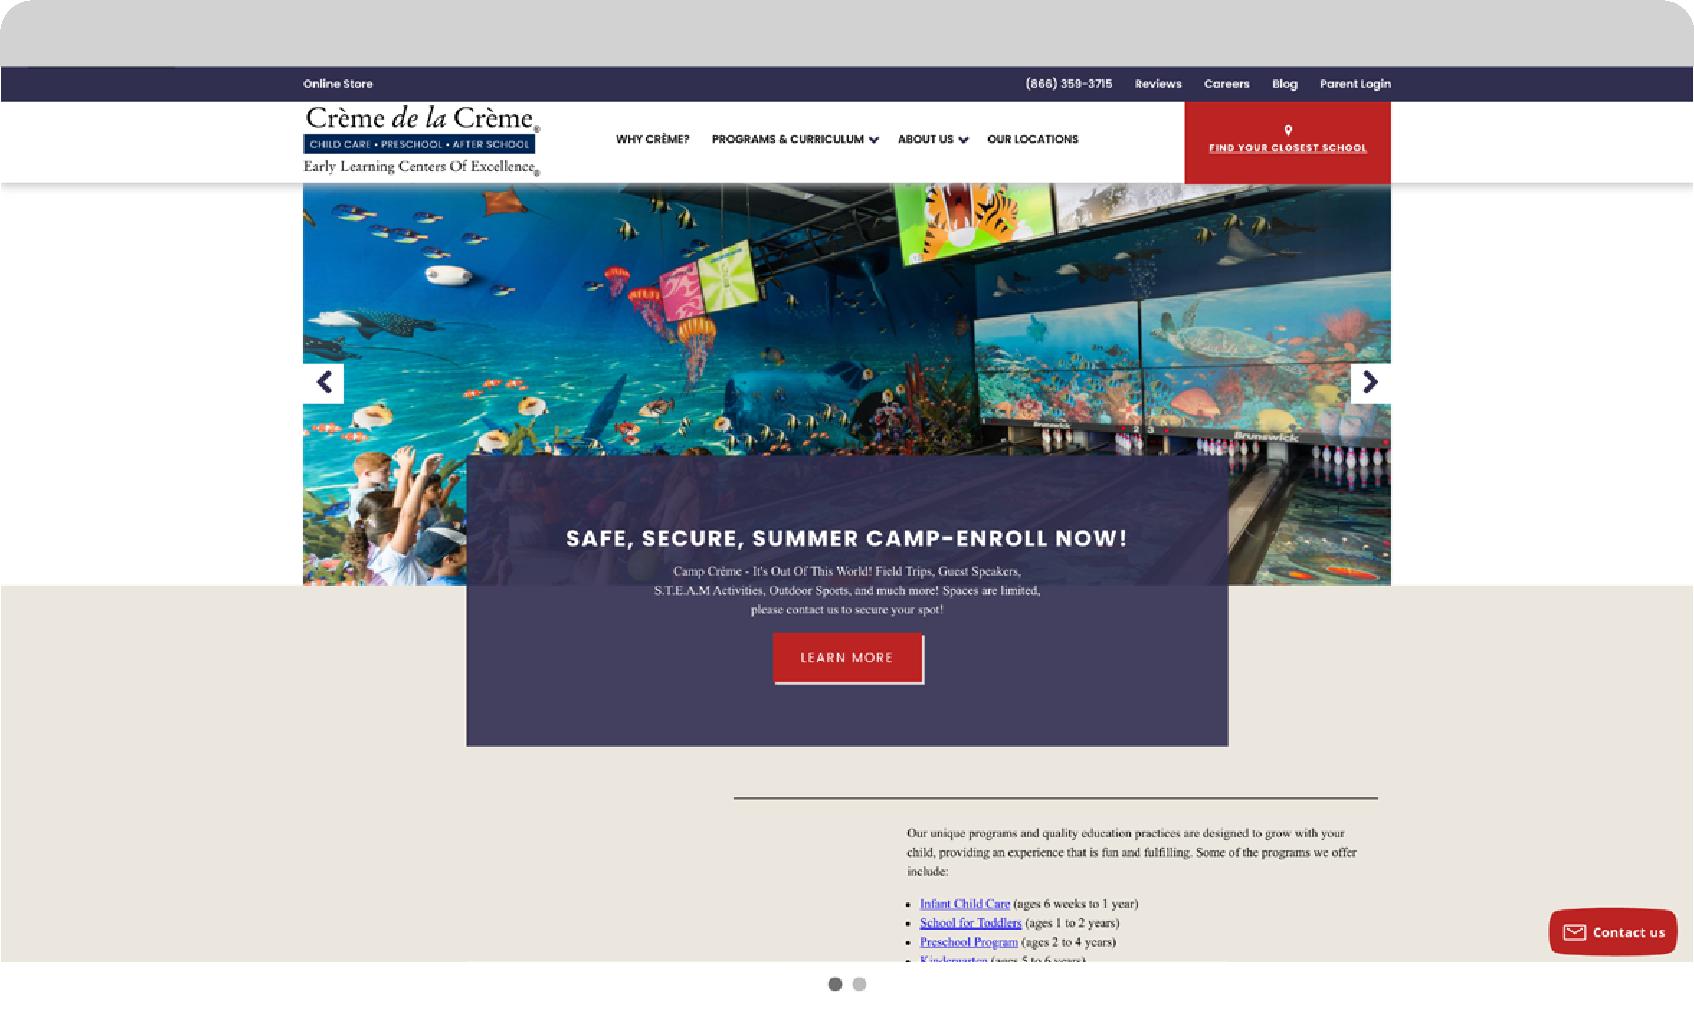 creme de la creme website mockup